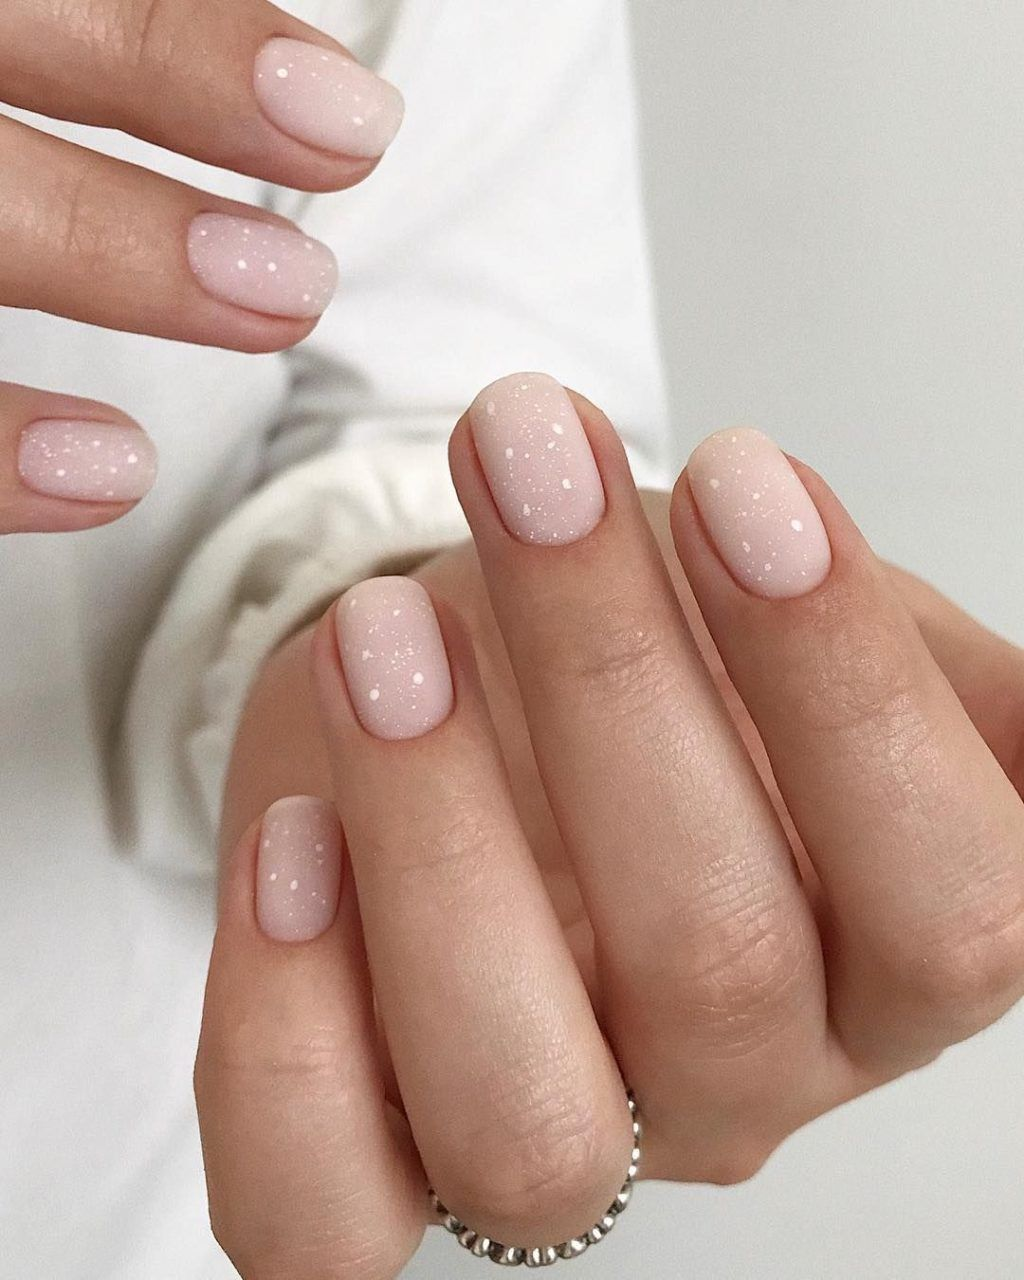 Winter manicure 2020-2021. Winter nail design ideas in ...